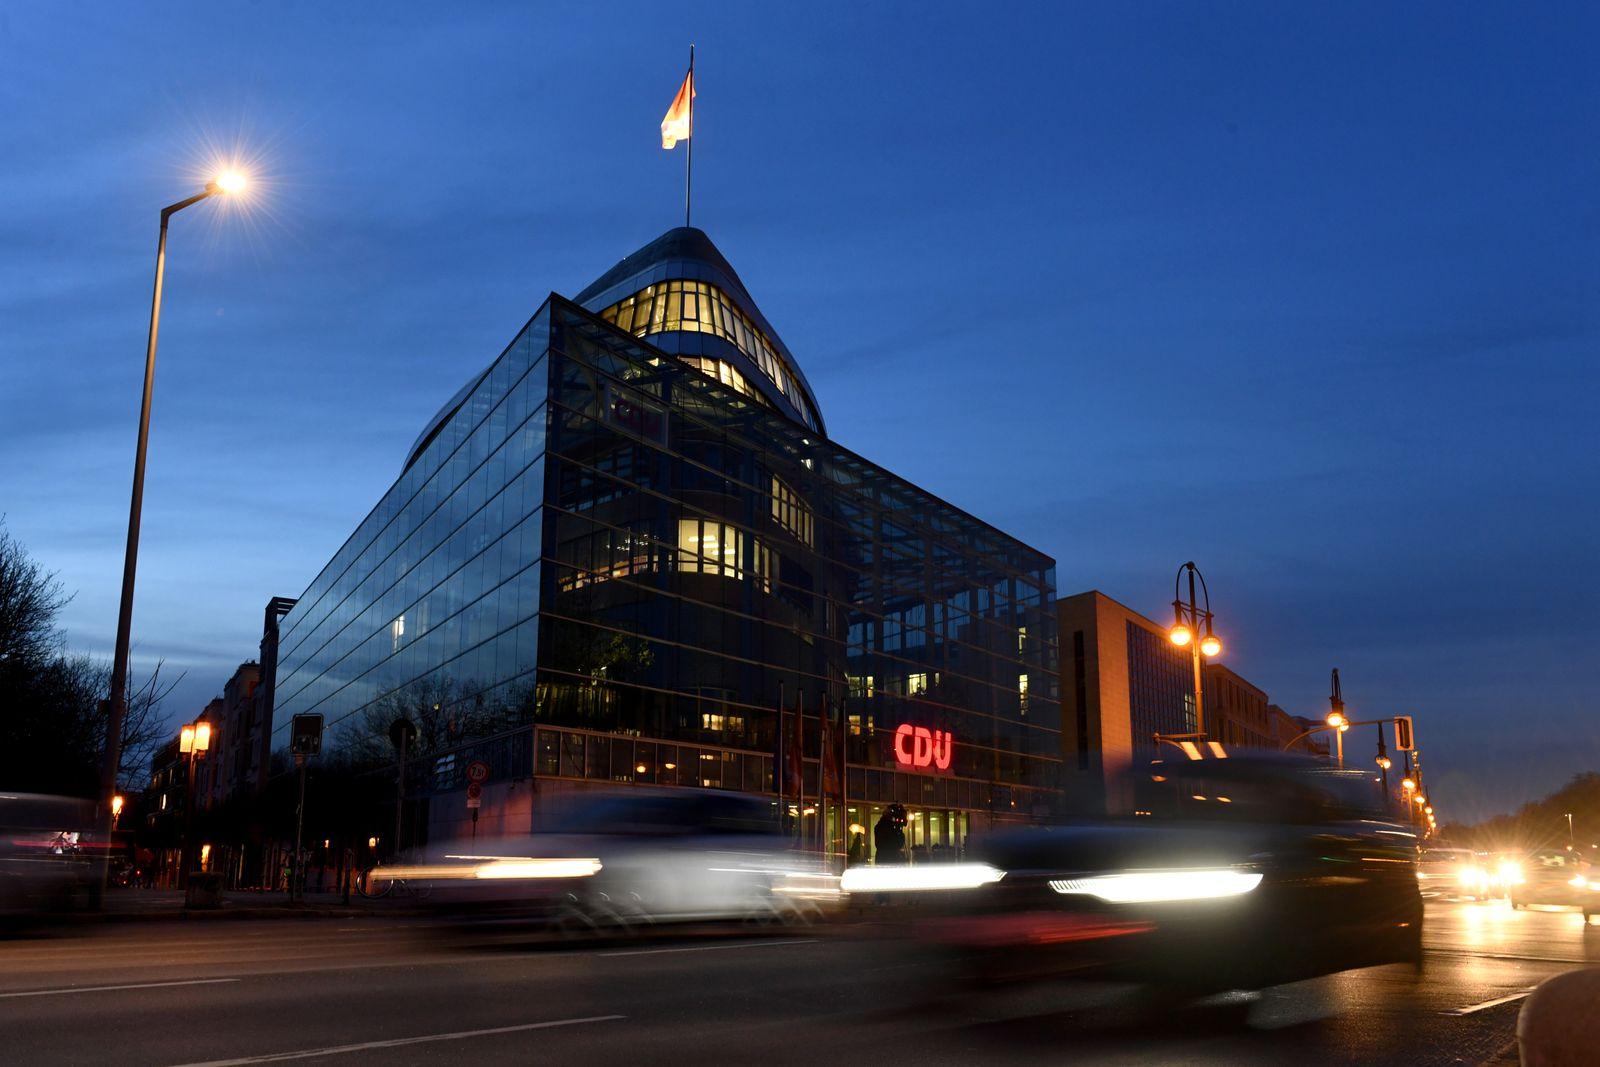 Christian Democratic Union (CDU) party headquarters in Berlin